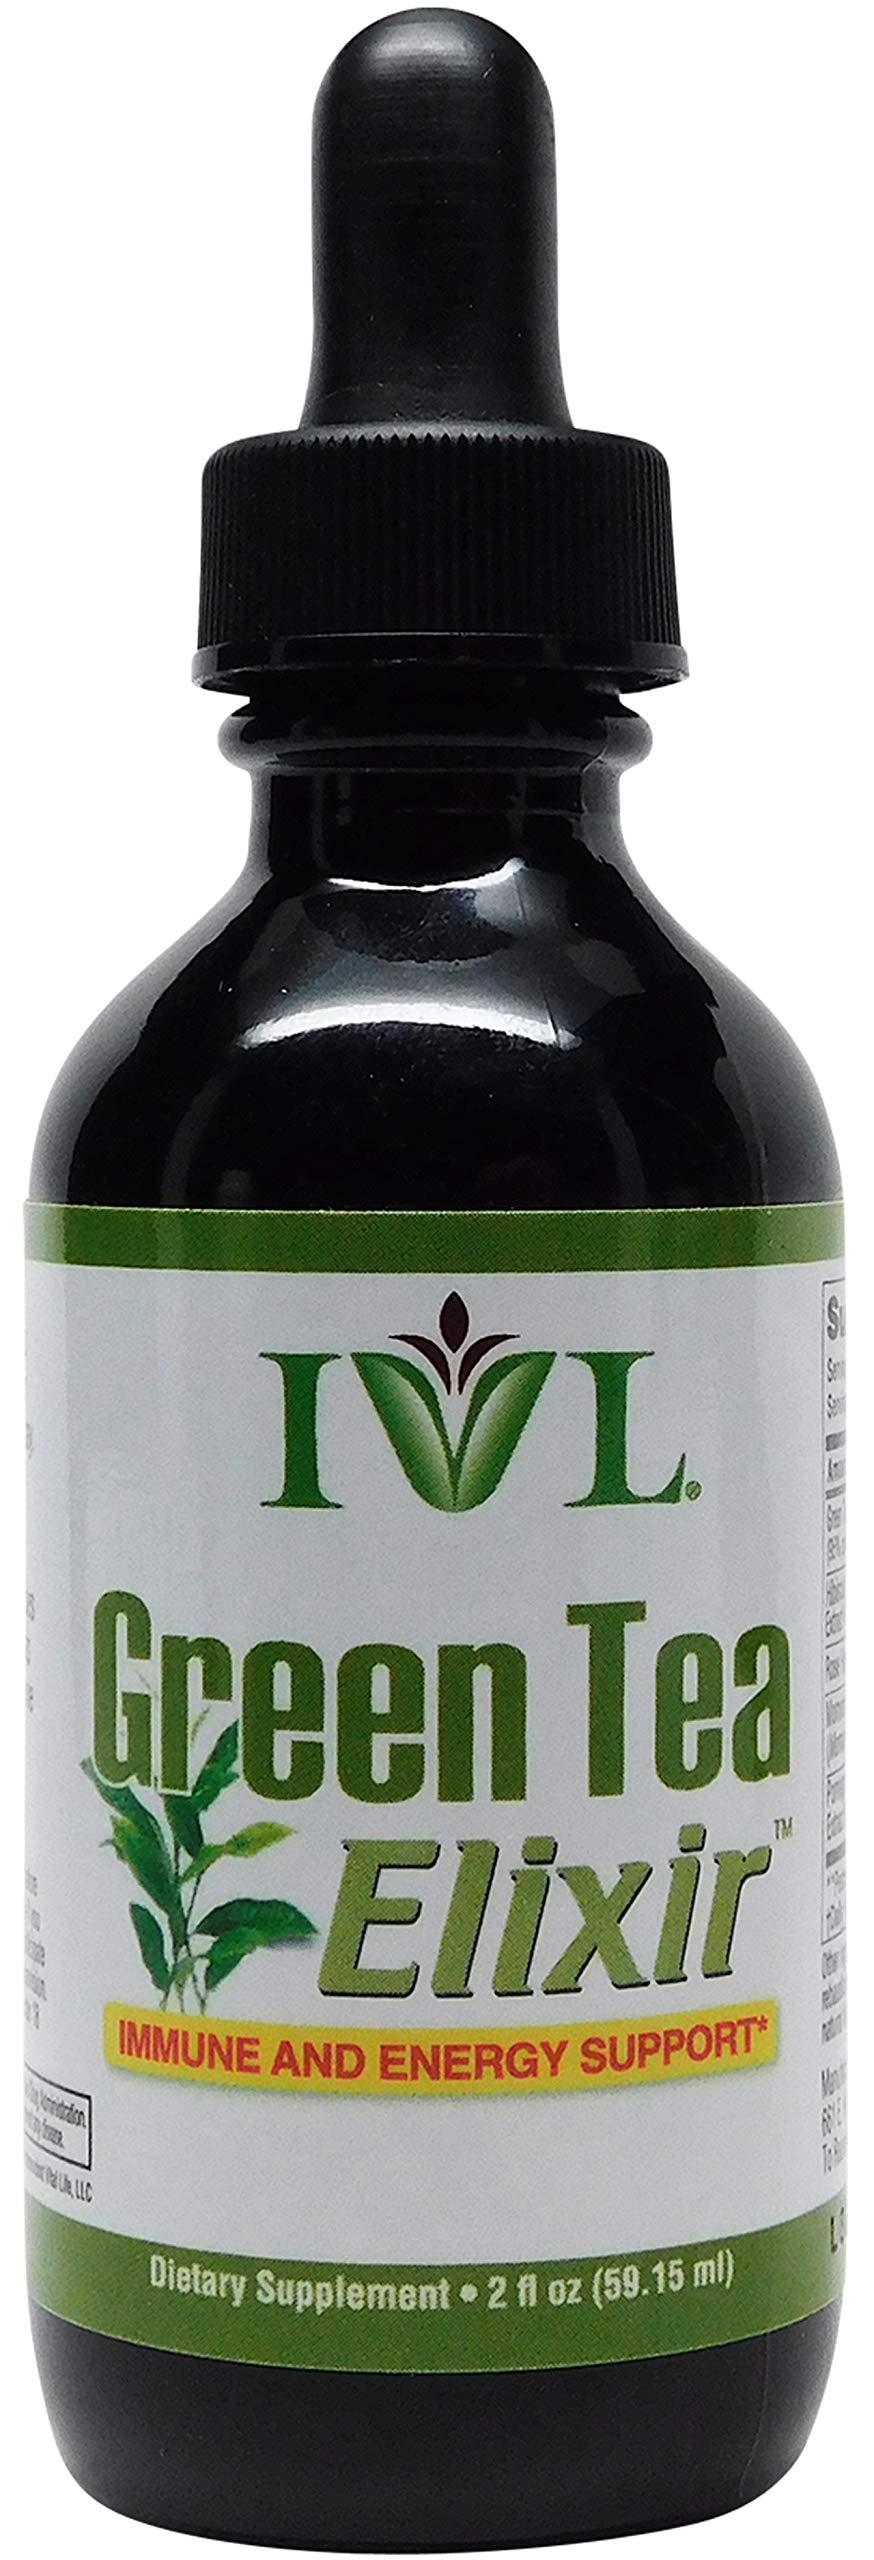 IVL - Green Tea Elixir Immune and Energy Formula, 2 fl oz Bottle